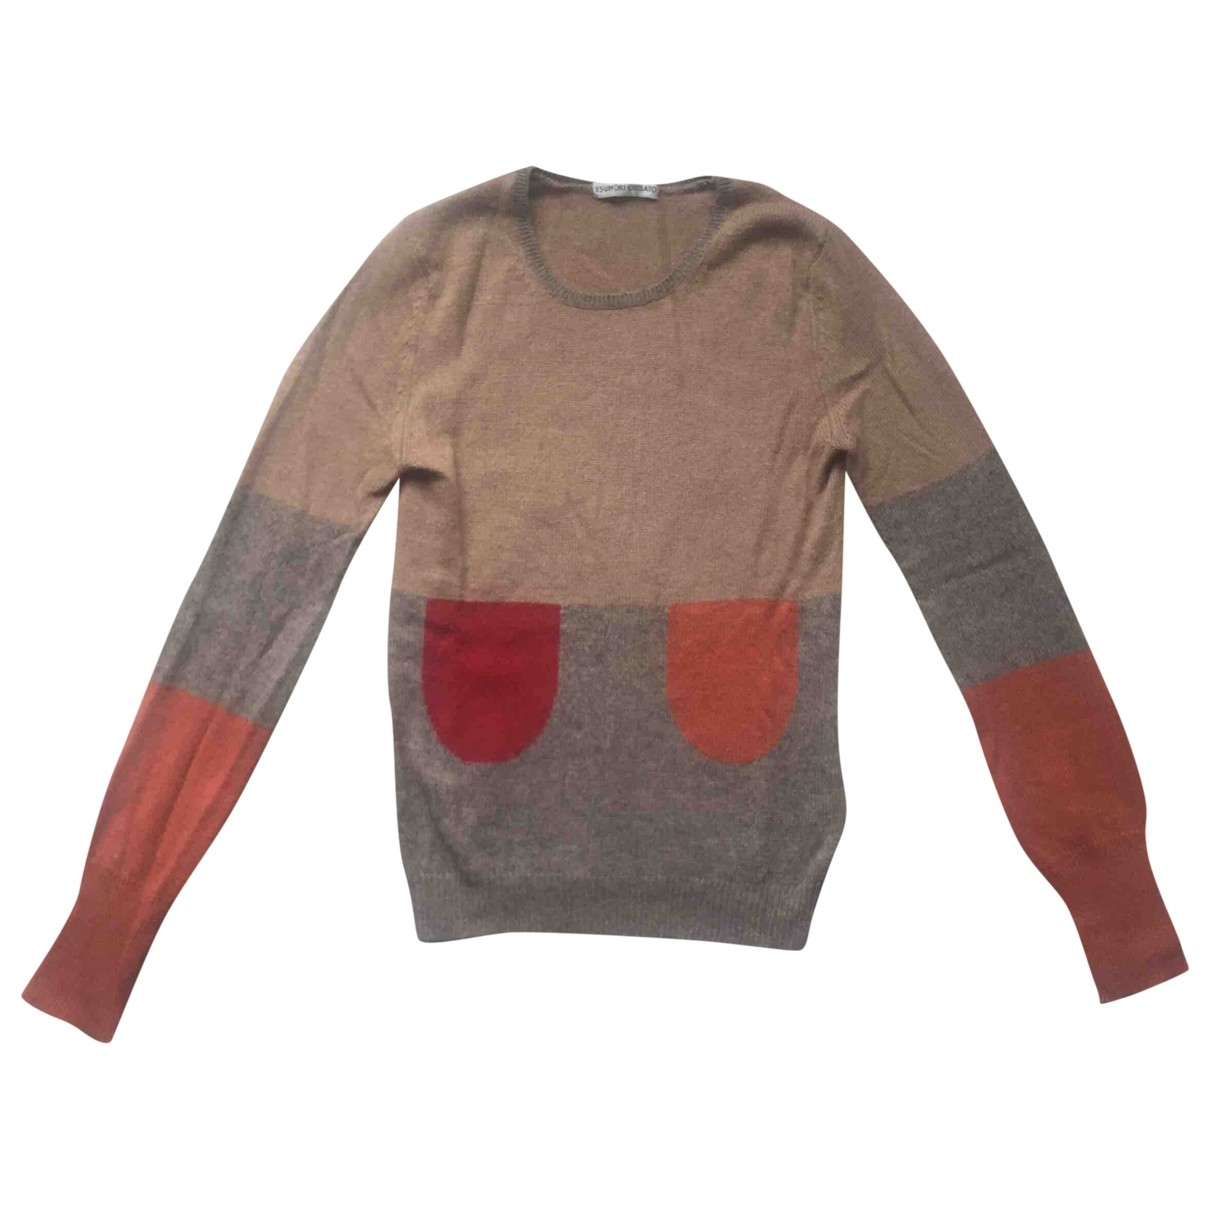 Tsumori Chisato - Pull   pour femme en laine - beige